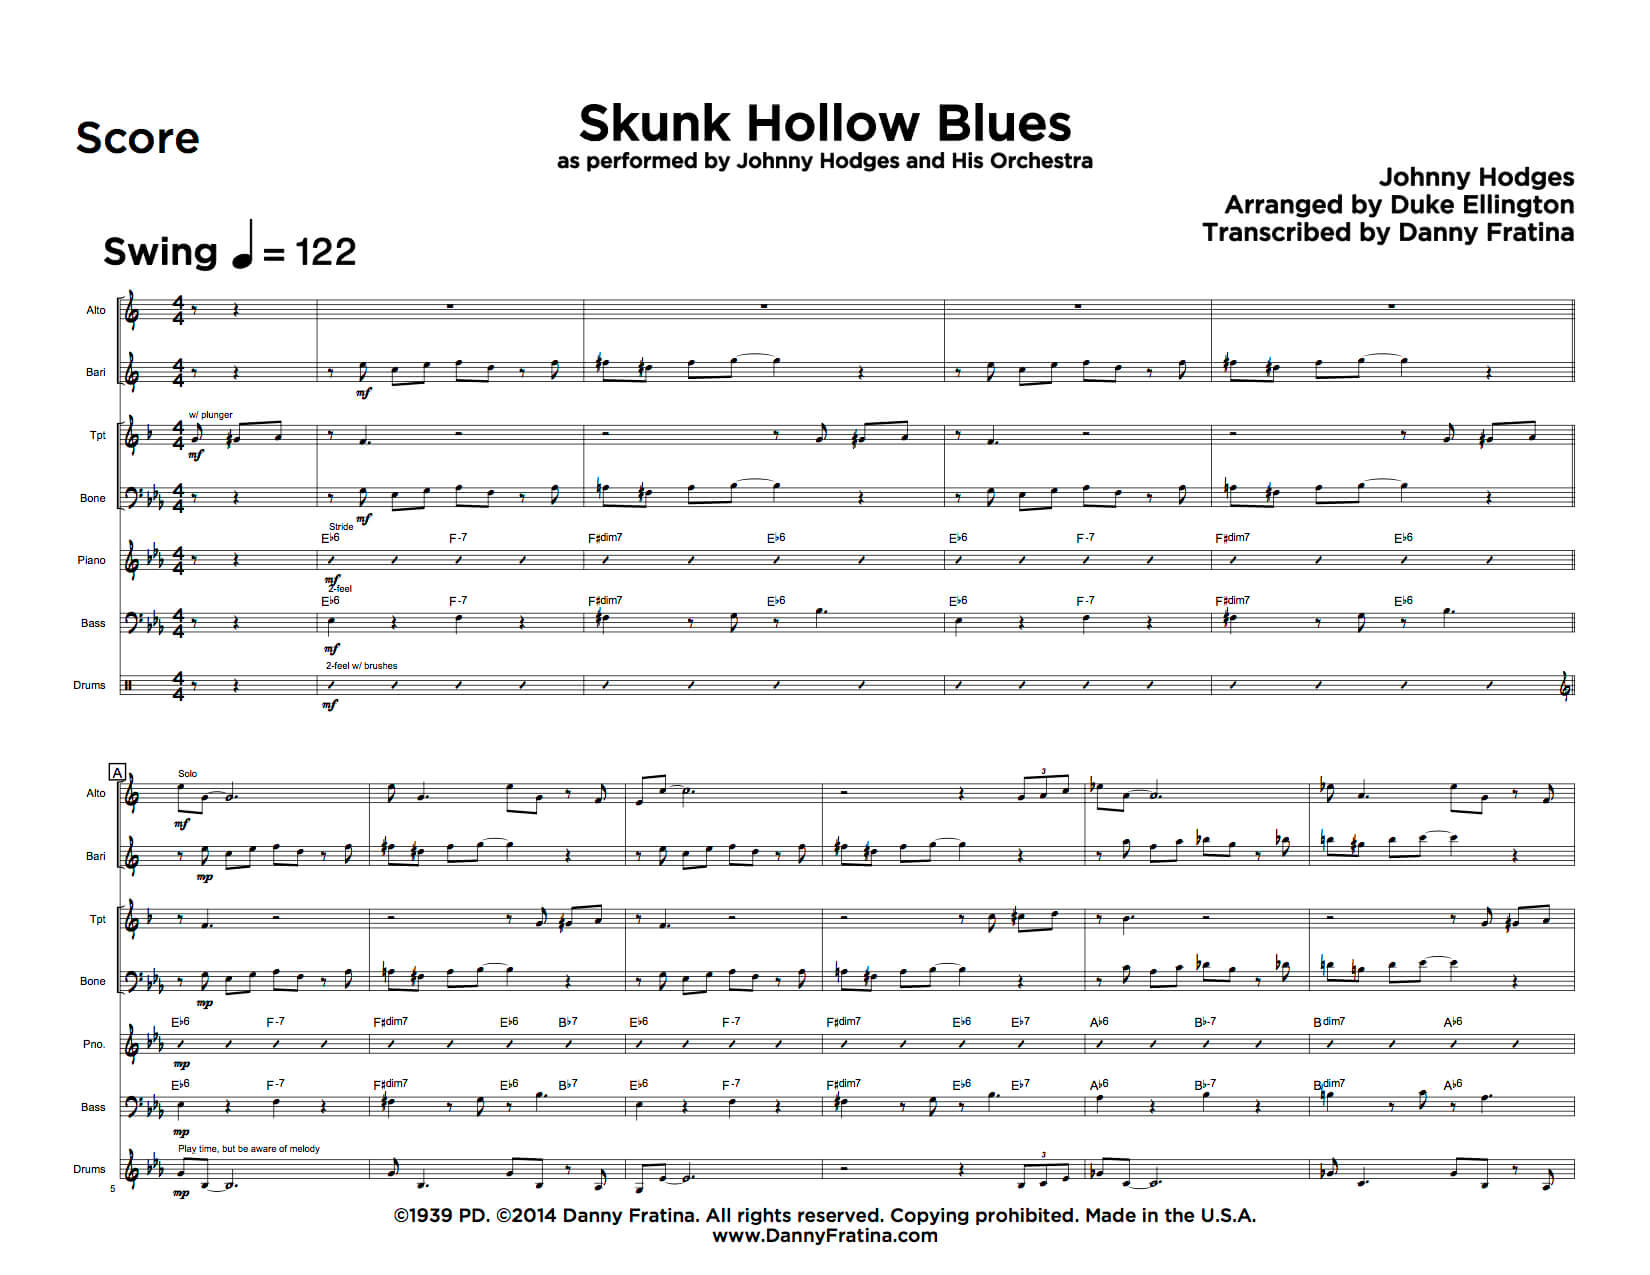 Skunk Hollow Blues